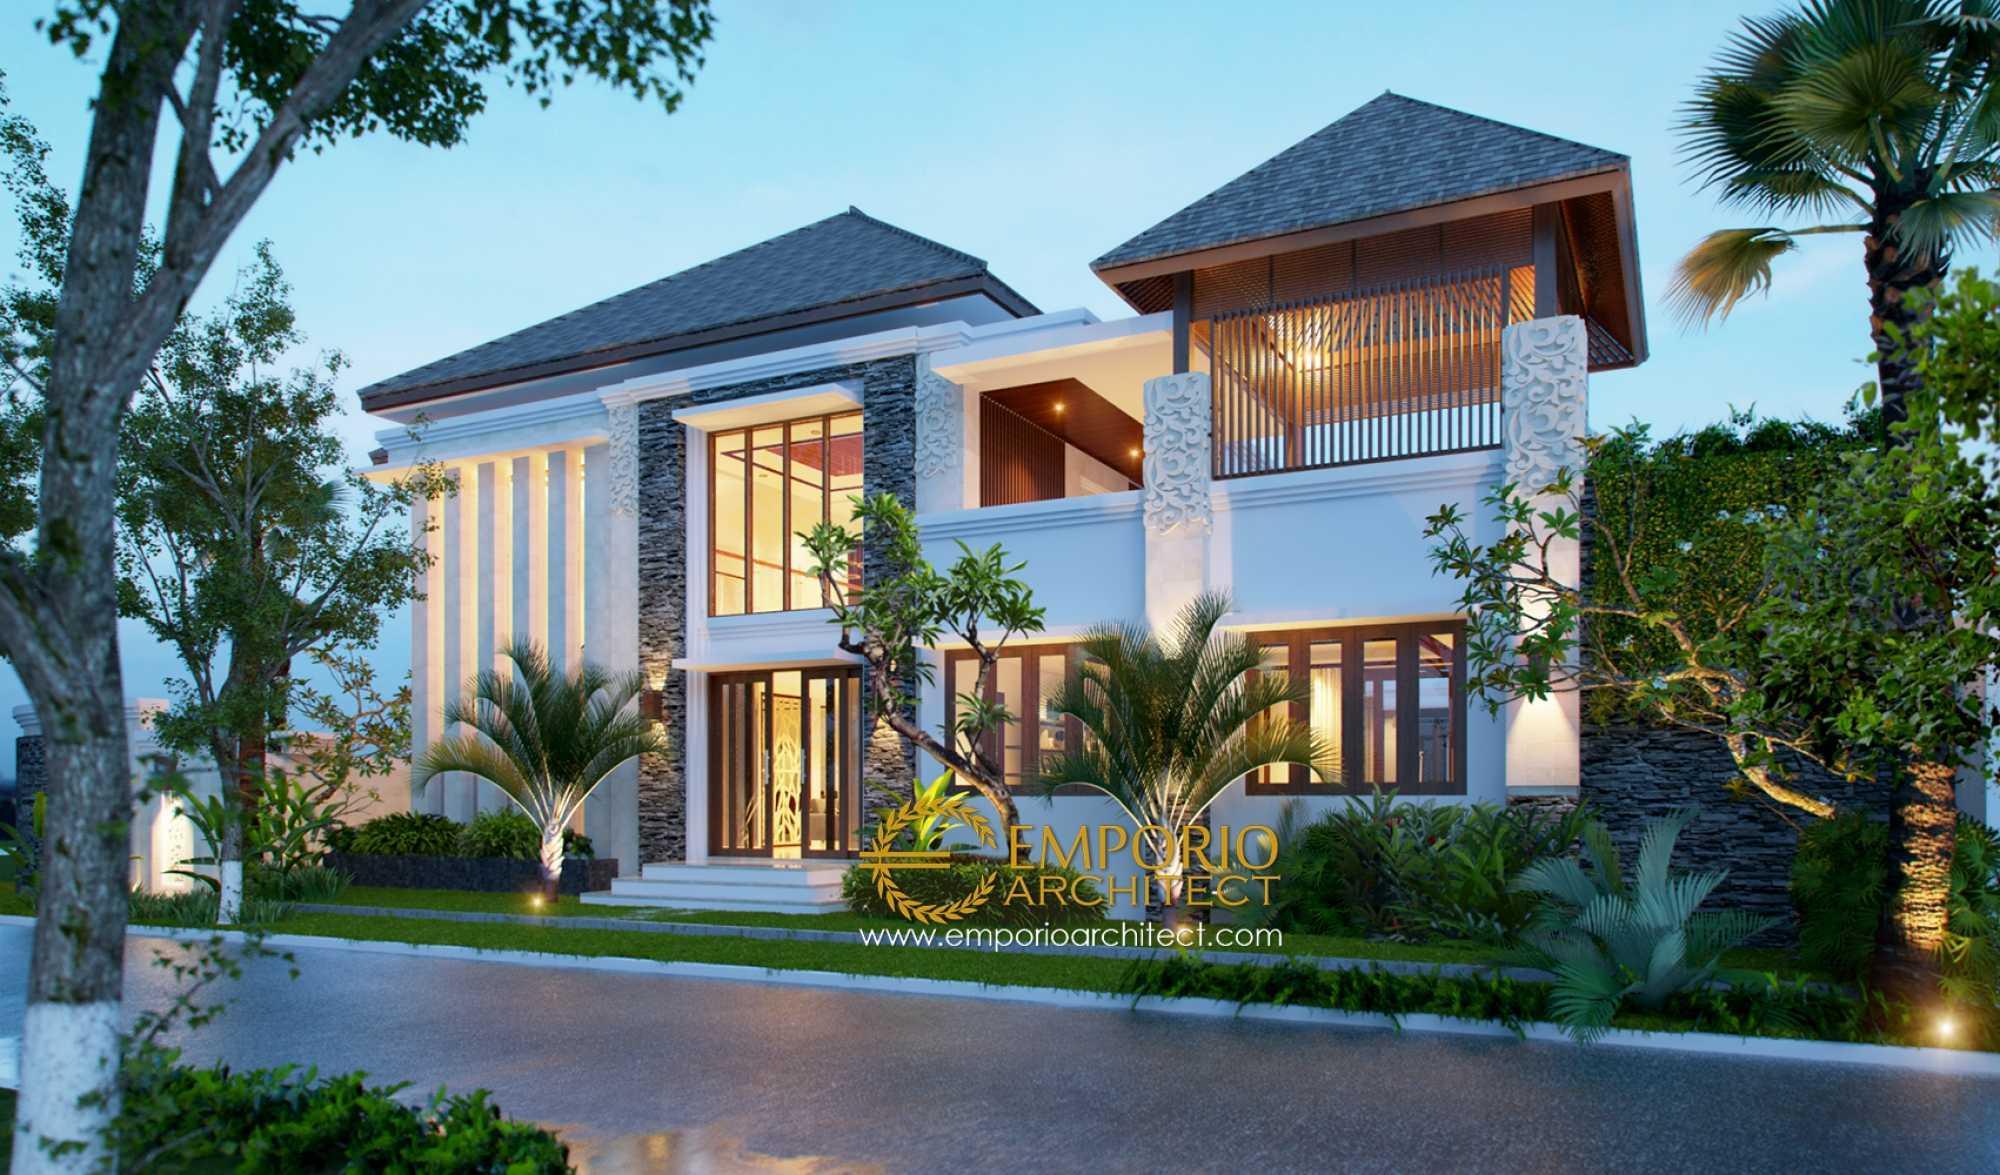 Emporio Architect Desain Rumah Villa Bali Tropis 395 @ Bekasi Bekasi, Kota Bks, Jawa Barat, Indonesia Bekasi, Kota Bks, Jawa Barat, Indonesia Emporio-Architect-Desain-Rumah-Villa-Bali-Tropis-395-Bekasi  76938